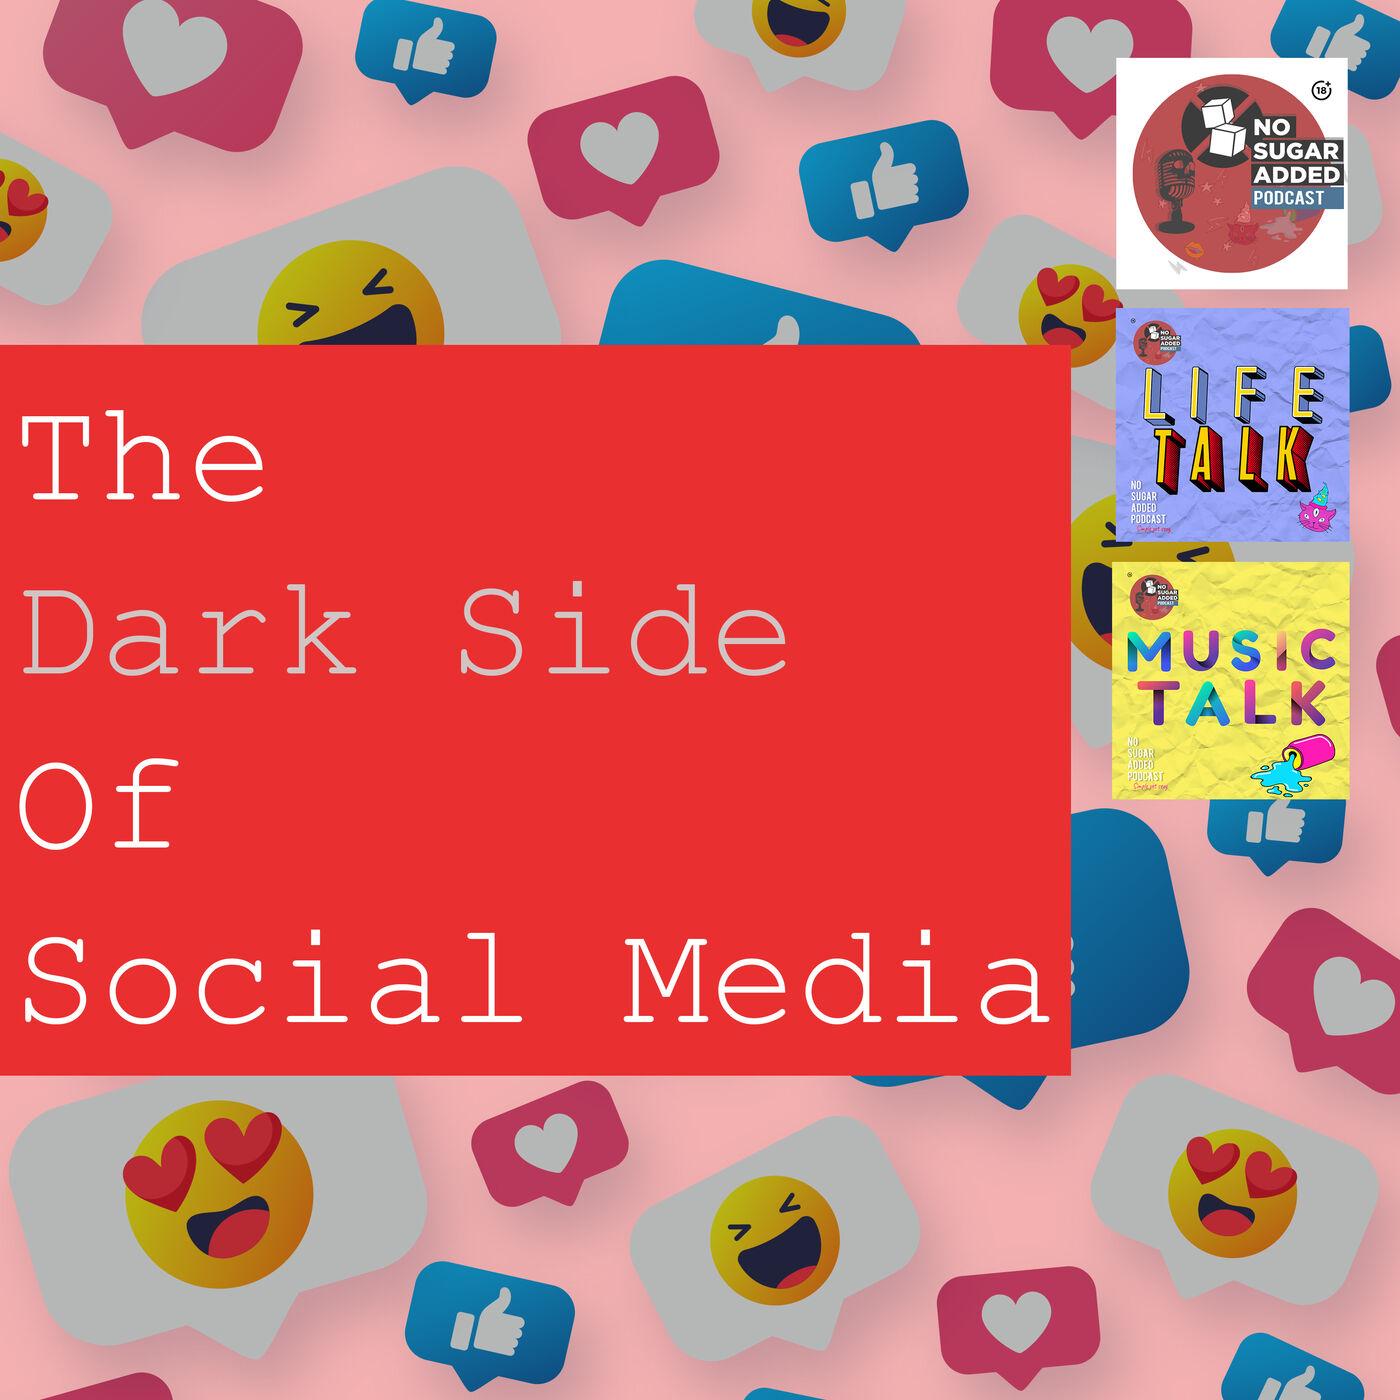 NSA Podcast: The Dark side of social media (Episode 5)